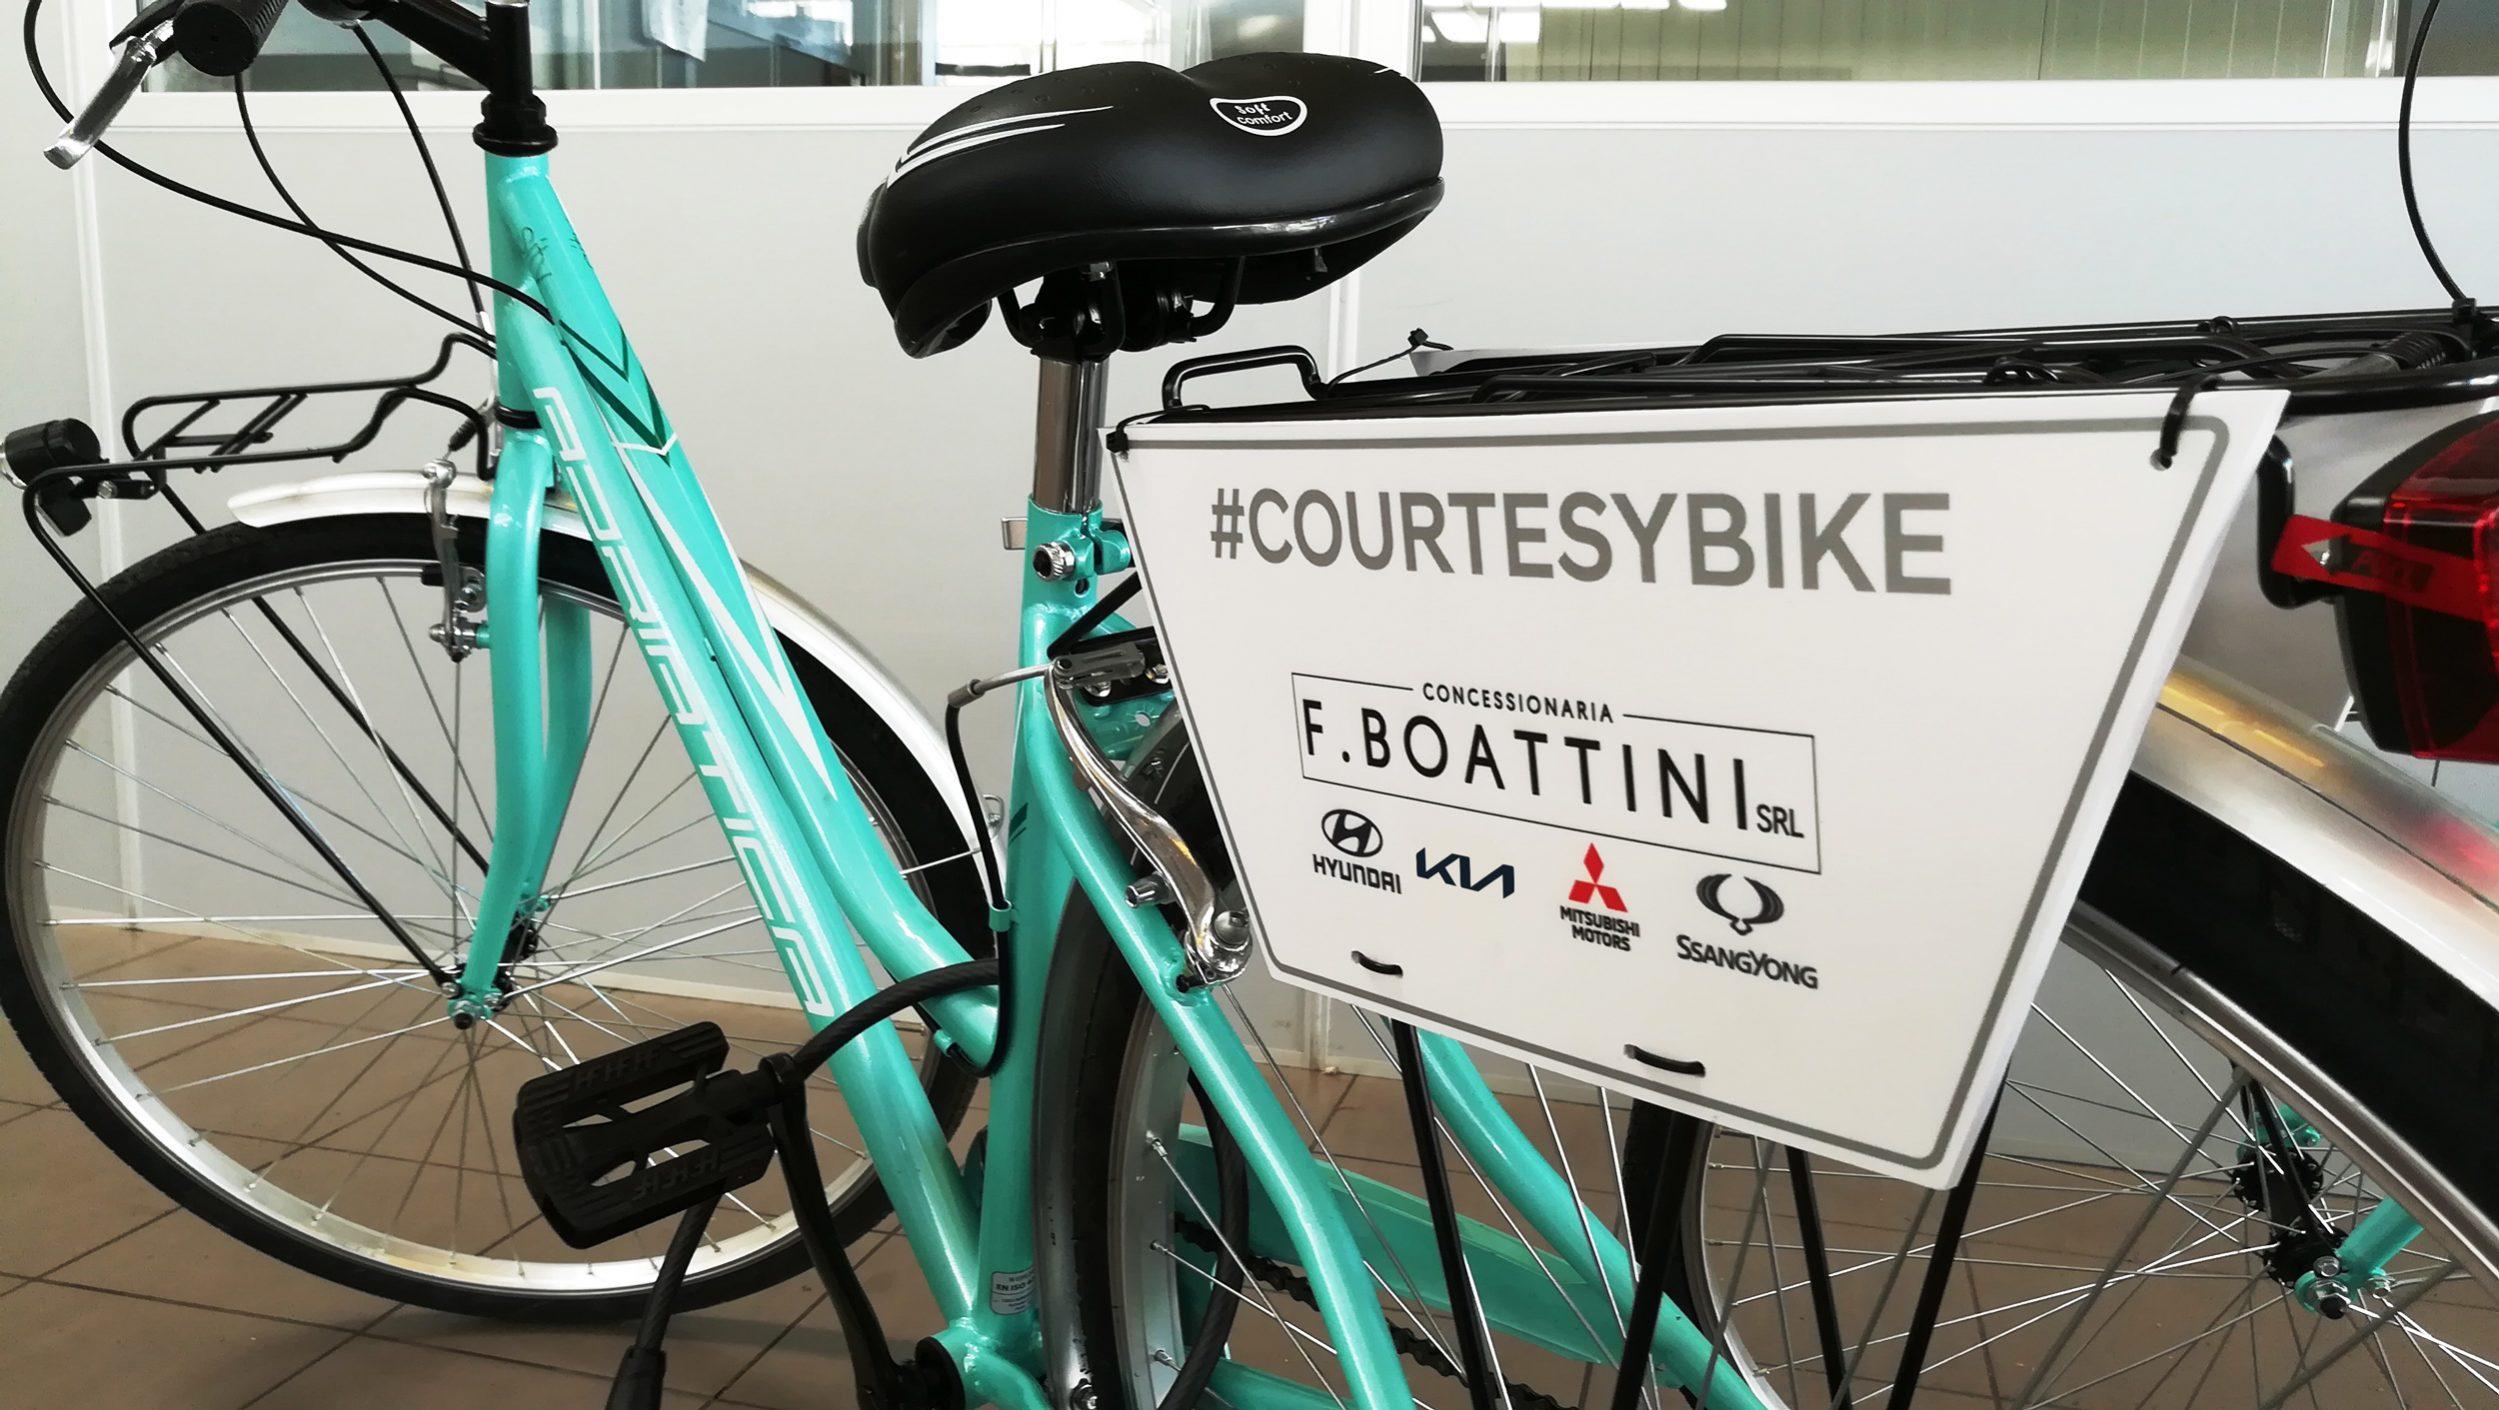 Courtesy Bike Officina Boattini Pesaro